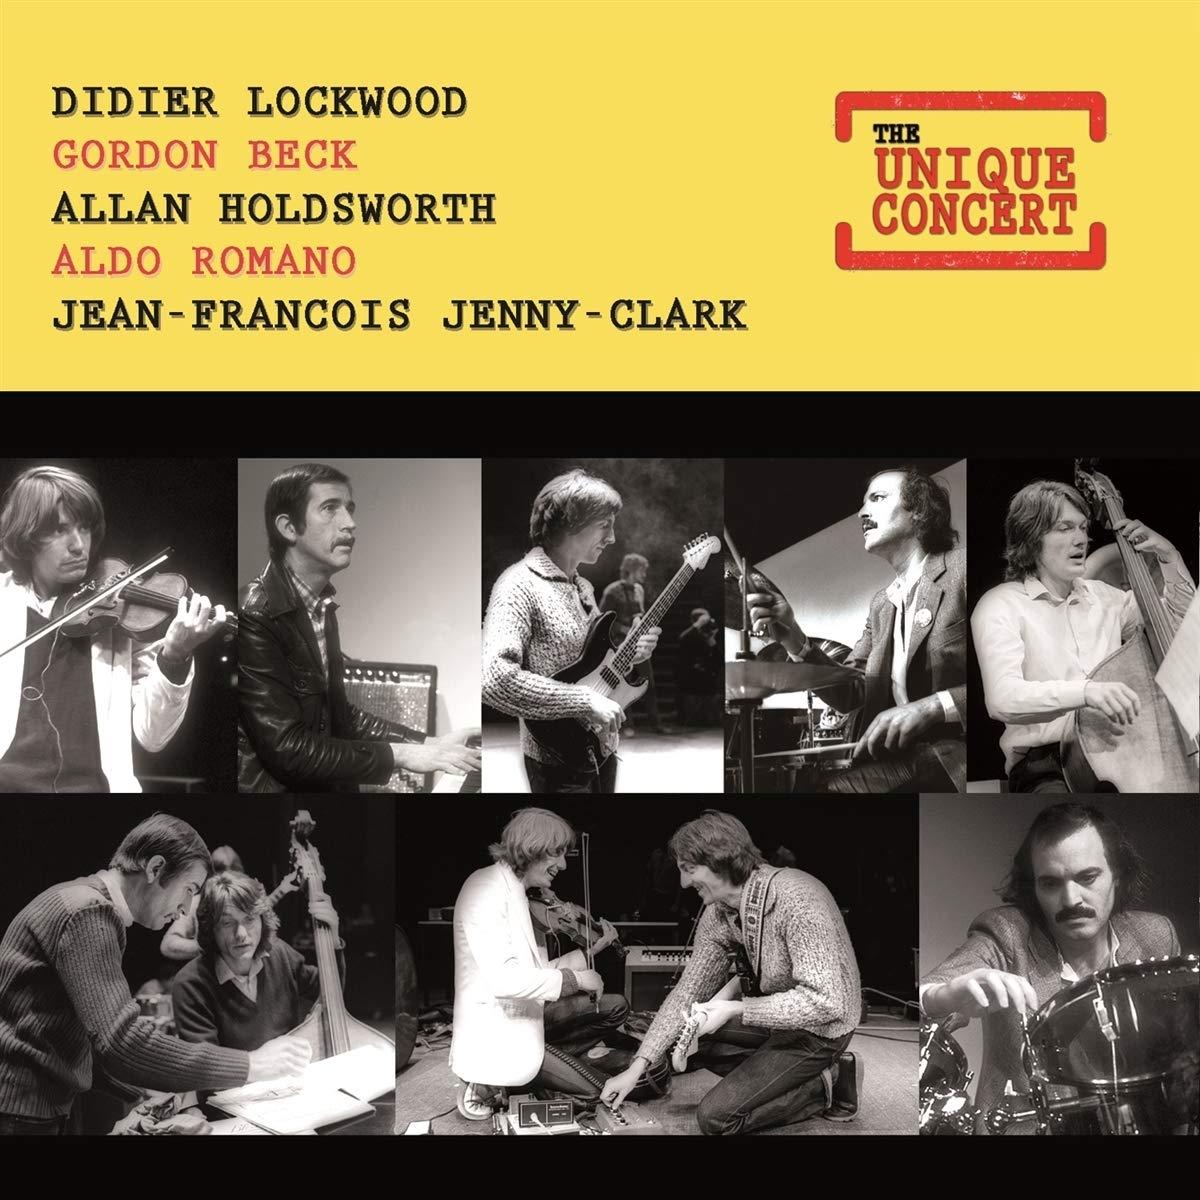 DIDIER LOCKWOOD - Didier Lockwood & Gordon Beck & Allan Holdworth & Aldo Romano & Jean-François Jenny-Clark : The Unique Concert cover